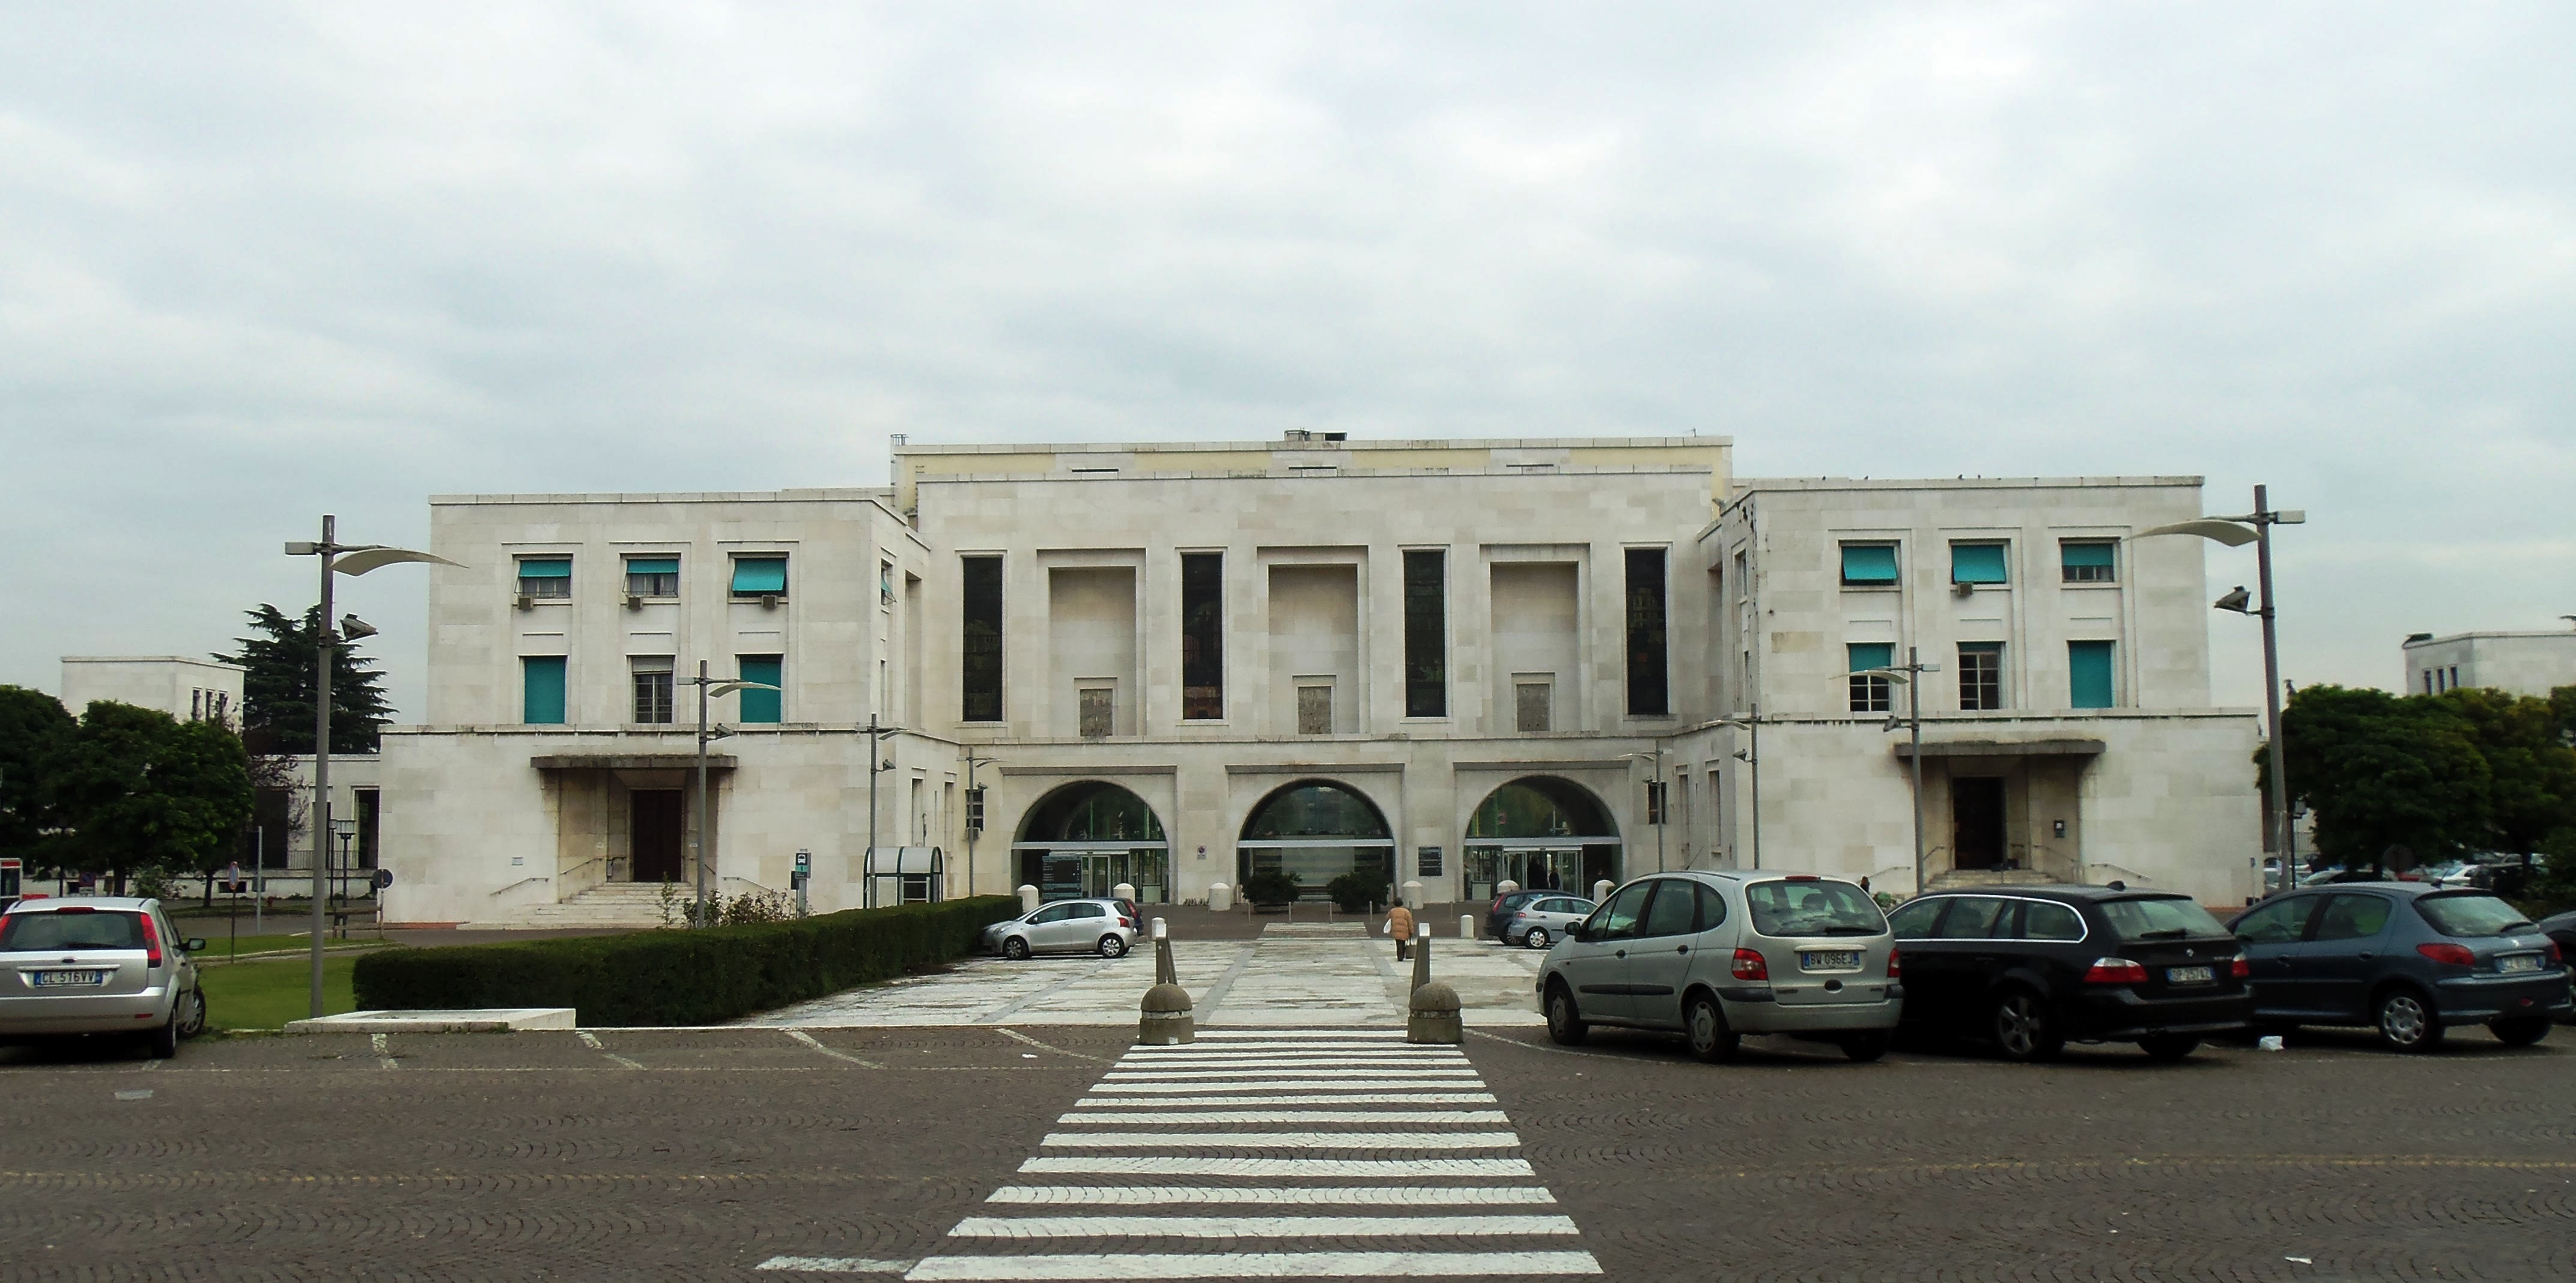 Ospedale_di_Niguarda